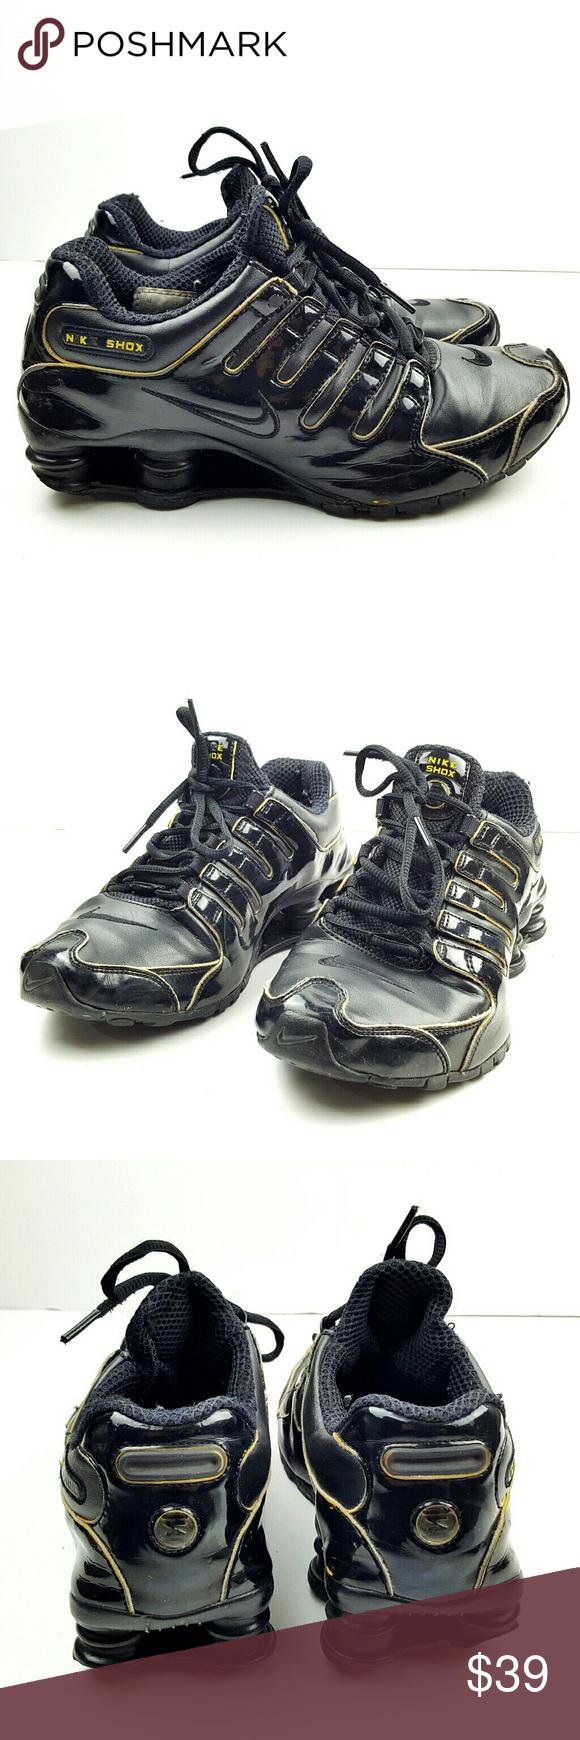 Nike Talla Shox Mujeres Nike Shox Zapatillas Zapatillas Talla Nike 7 Color Negro Con f109db